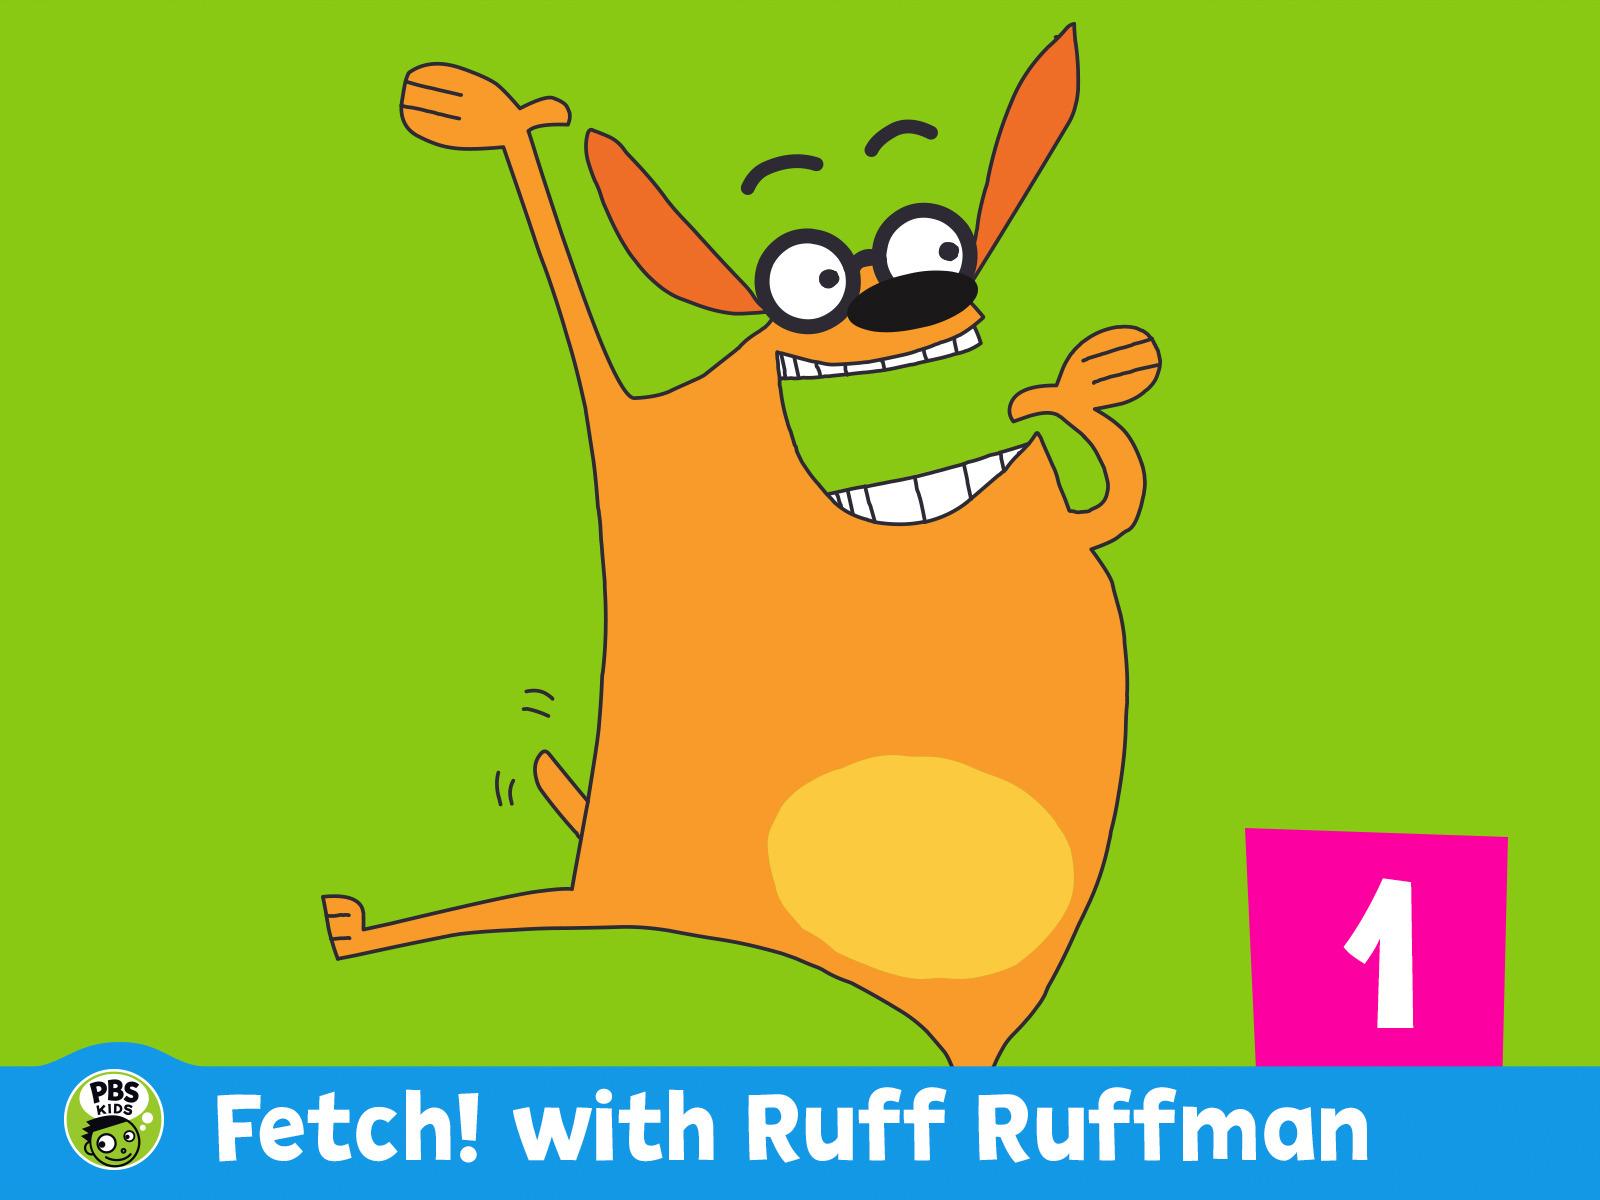 Prime Video: Fetch! With Ruff Ruffman Season 4